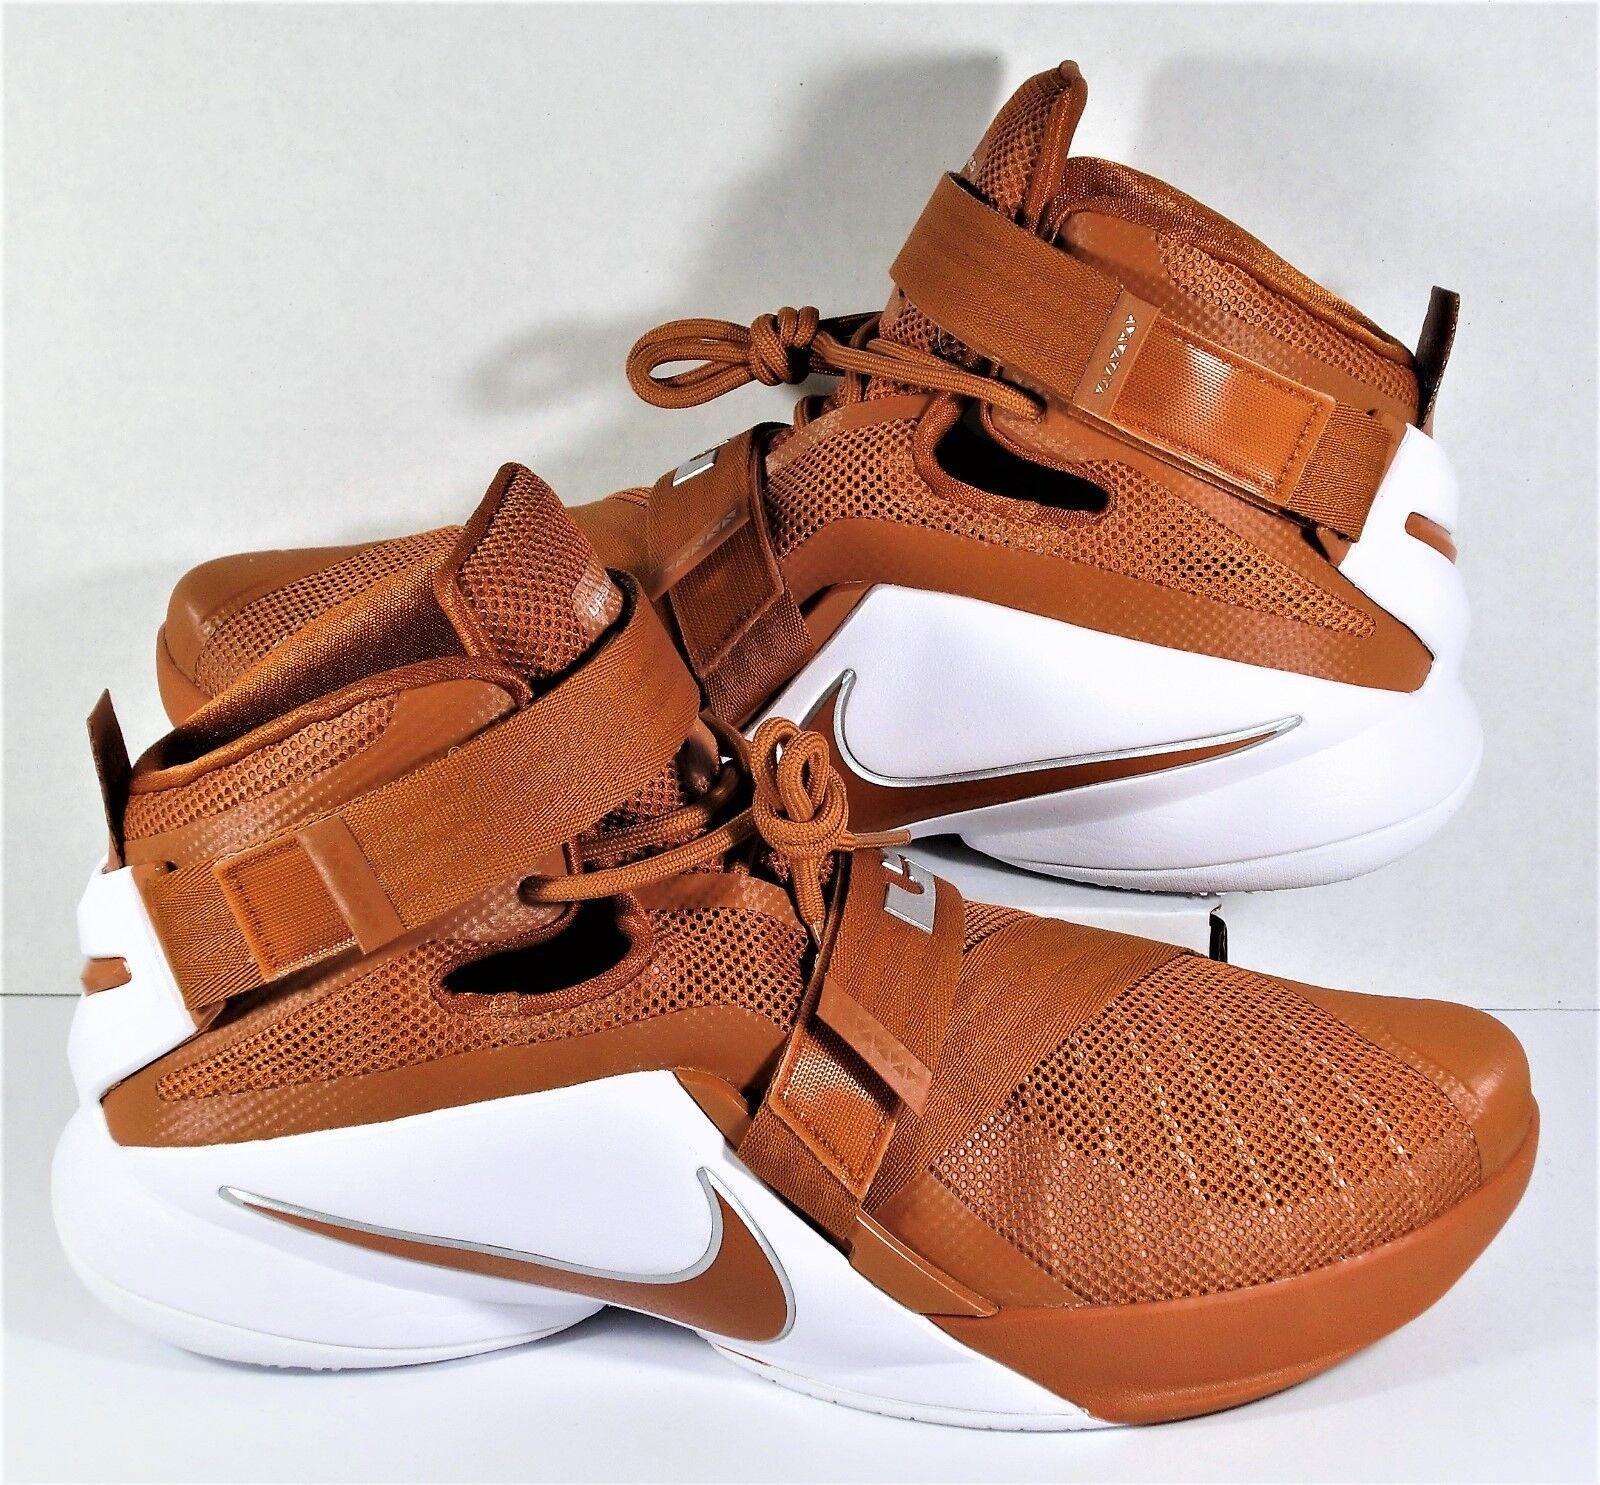 Nike Lebron Soldier IX TB Orange & White Promo Shoes Sz 14 NEW 813264 883 HTF